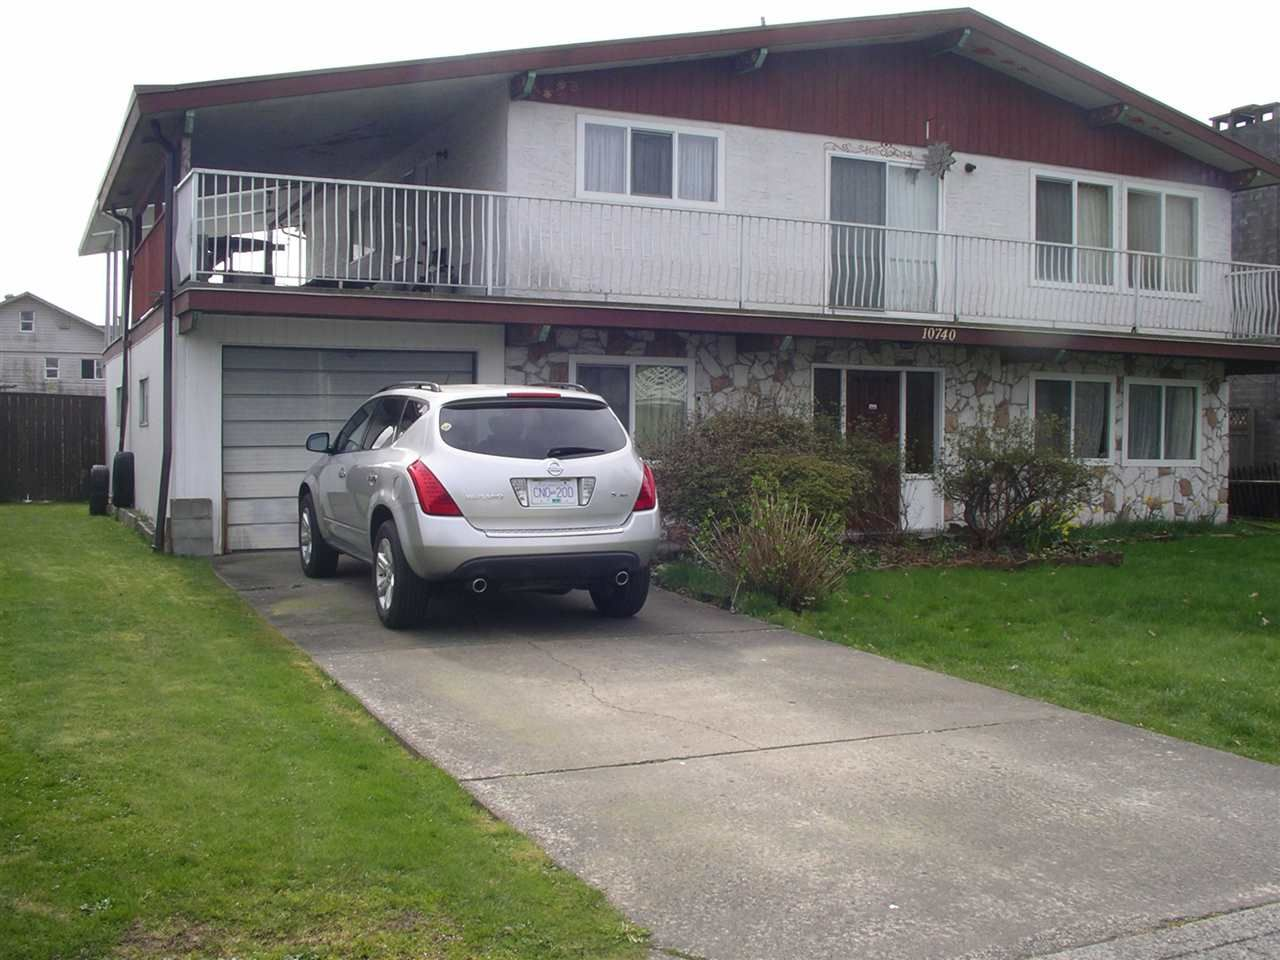 Main Photo: 10740 ANAHIM Drive in Richmond: McNair House for sale : MLS®# R2047558